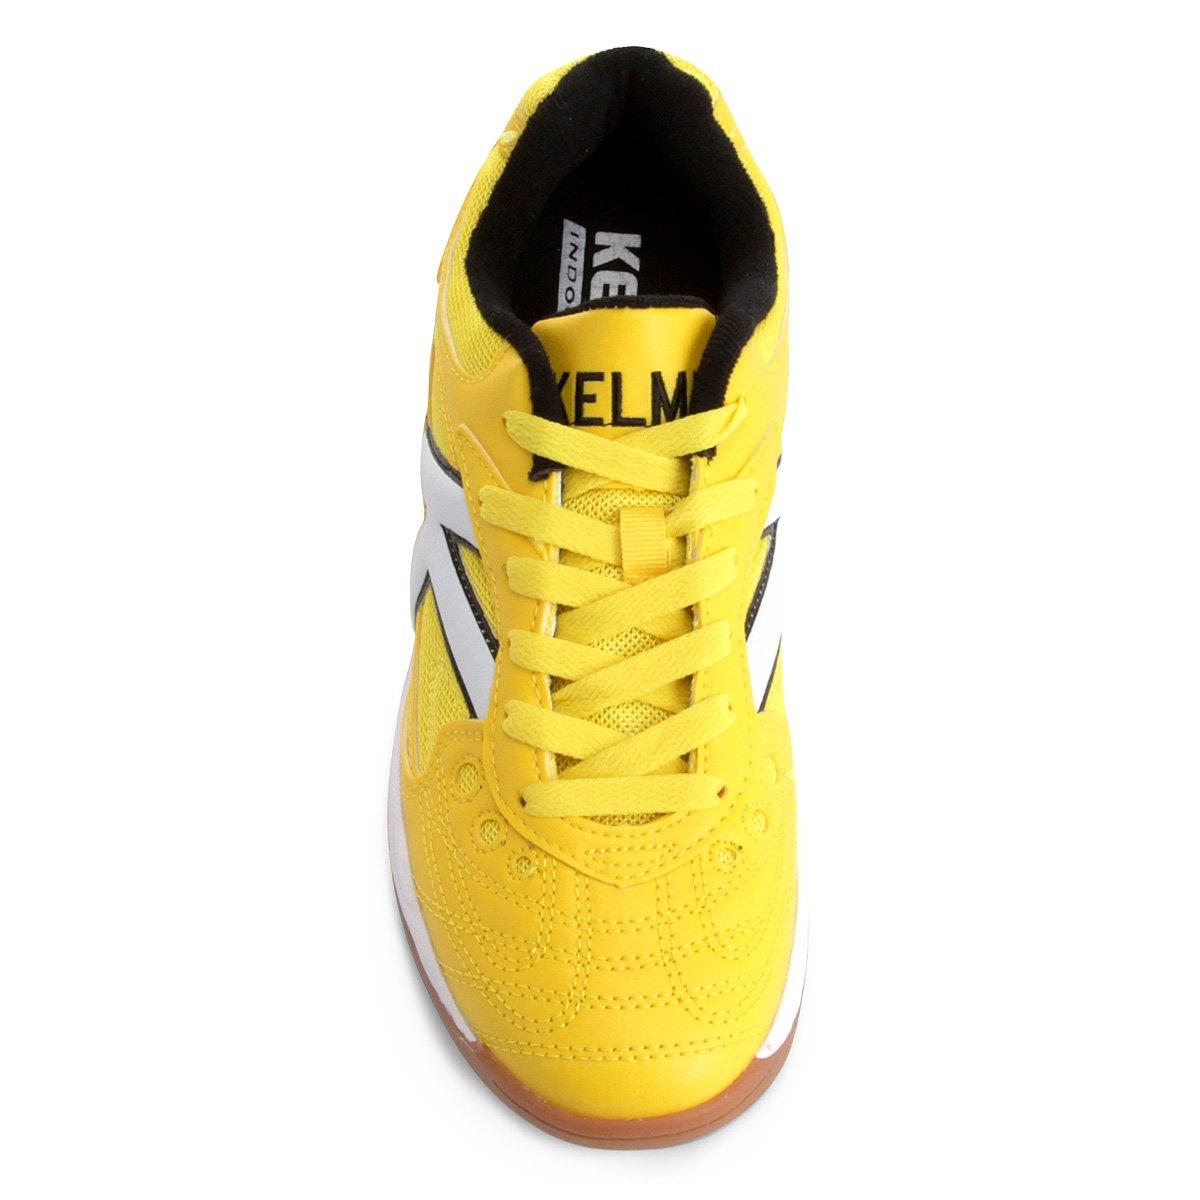 Chuteira Futsal Kelme Copa - Amarelo e Branco - Compre Agora  167c024d2c81f